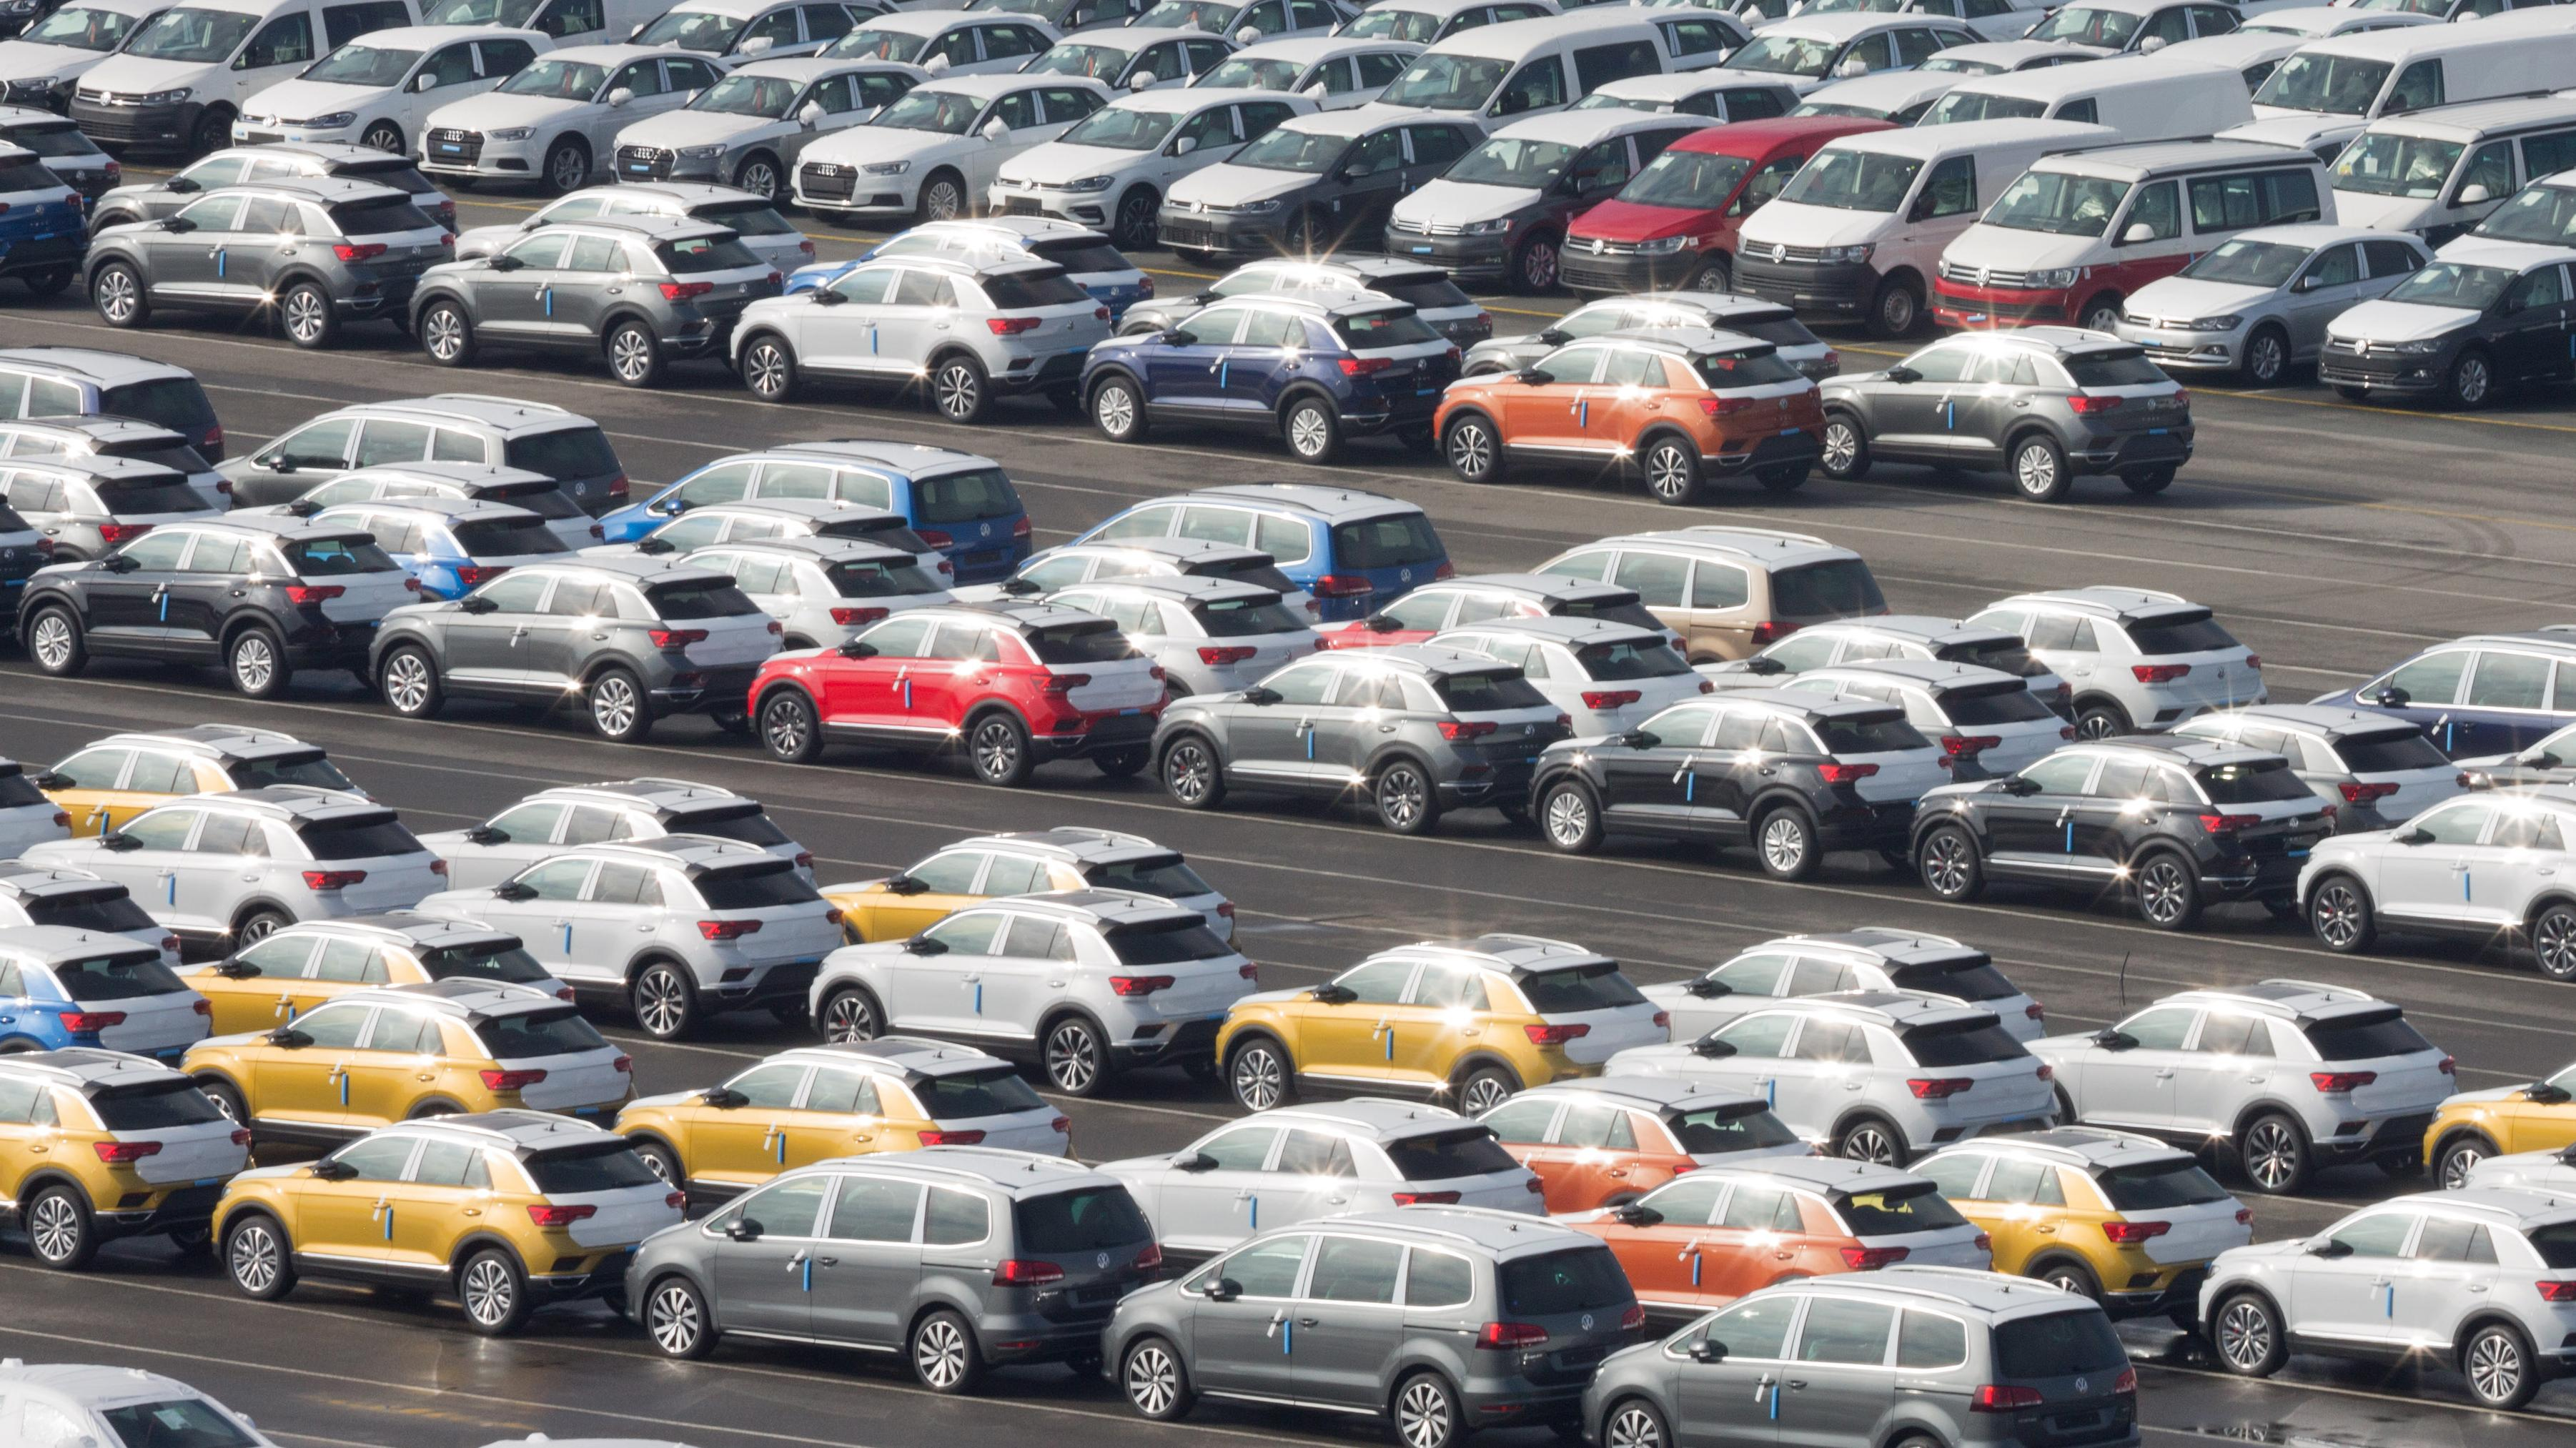 VW-Exportautos im Containerhafen/Emden